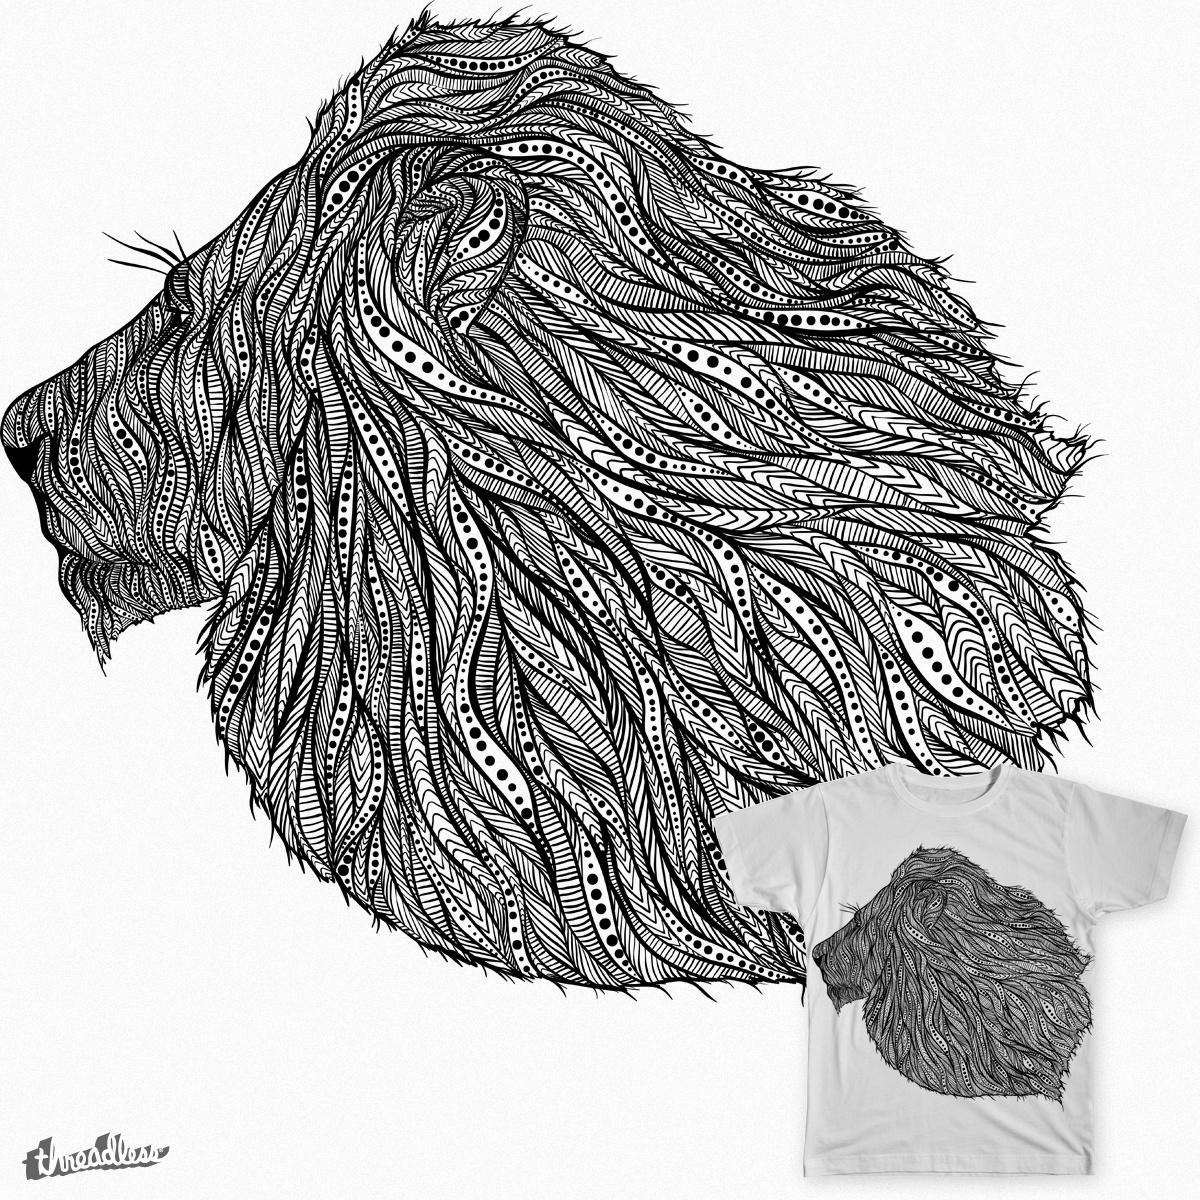 Native Lion by messthem on Threadless